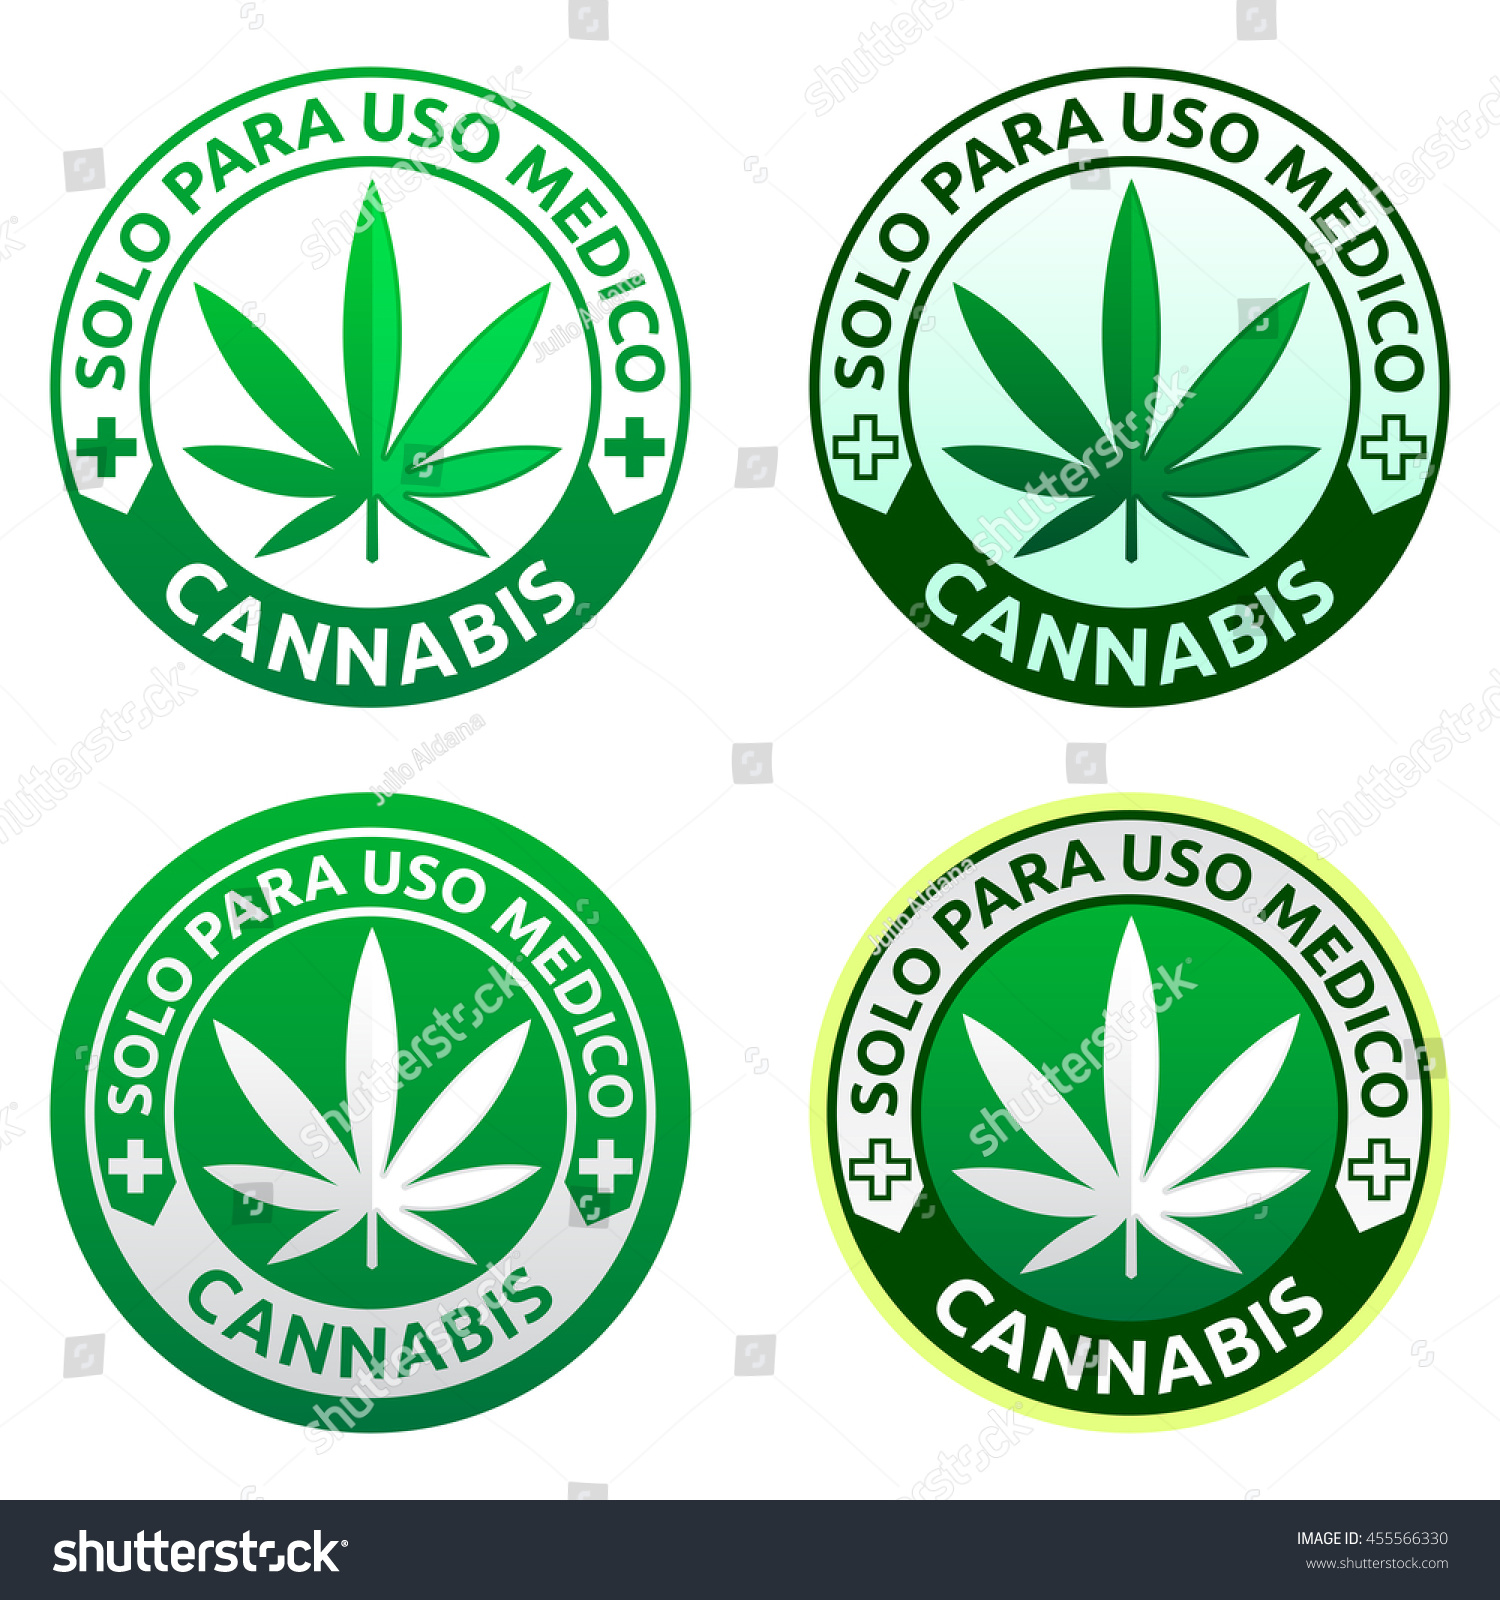 Royalty Free Cannabis Solo Para Uso Medico Only 455566330 Stock